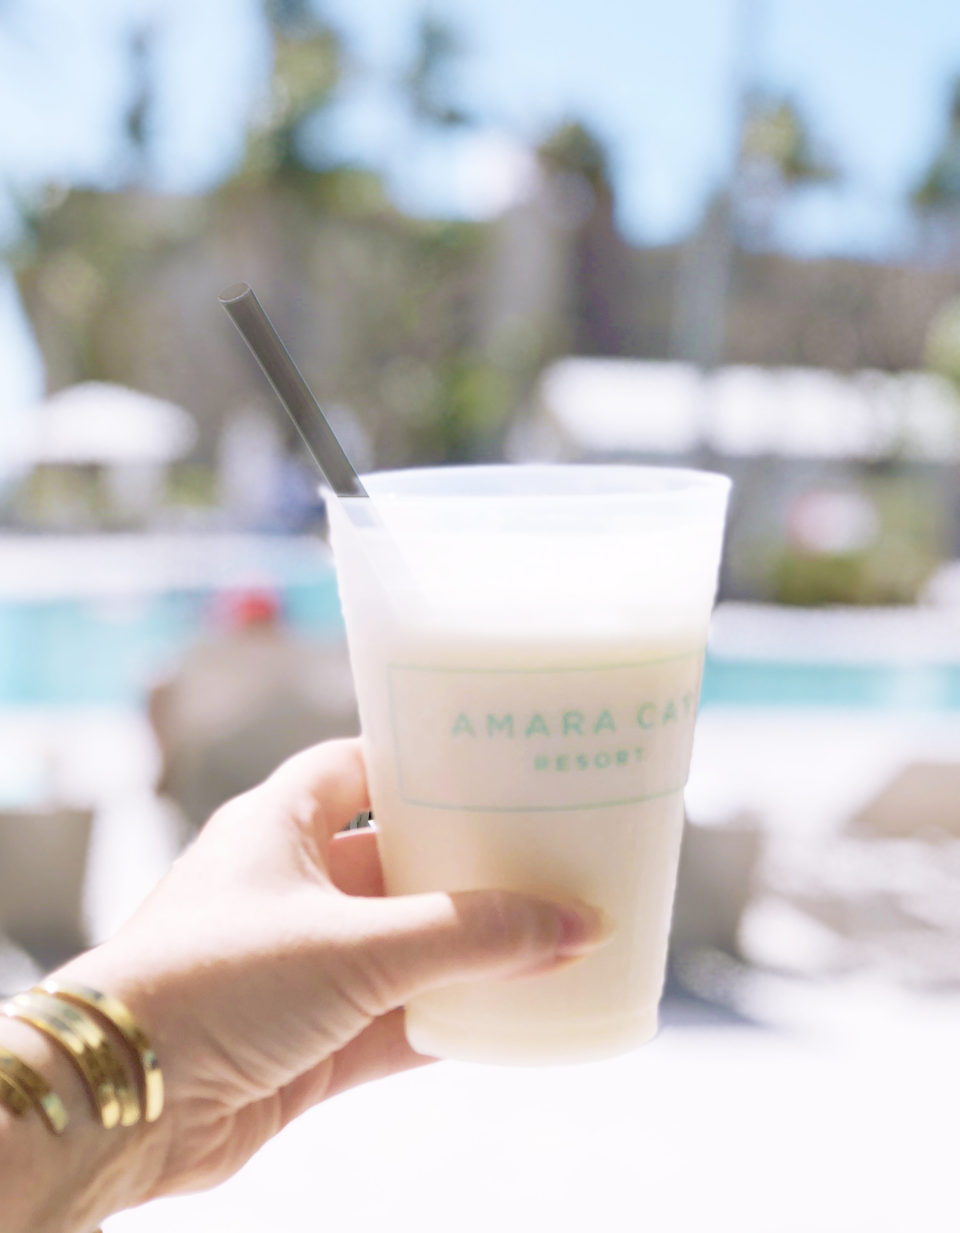 Amara Cay Resort Islamorada Pina Colada